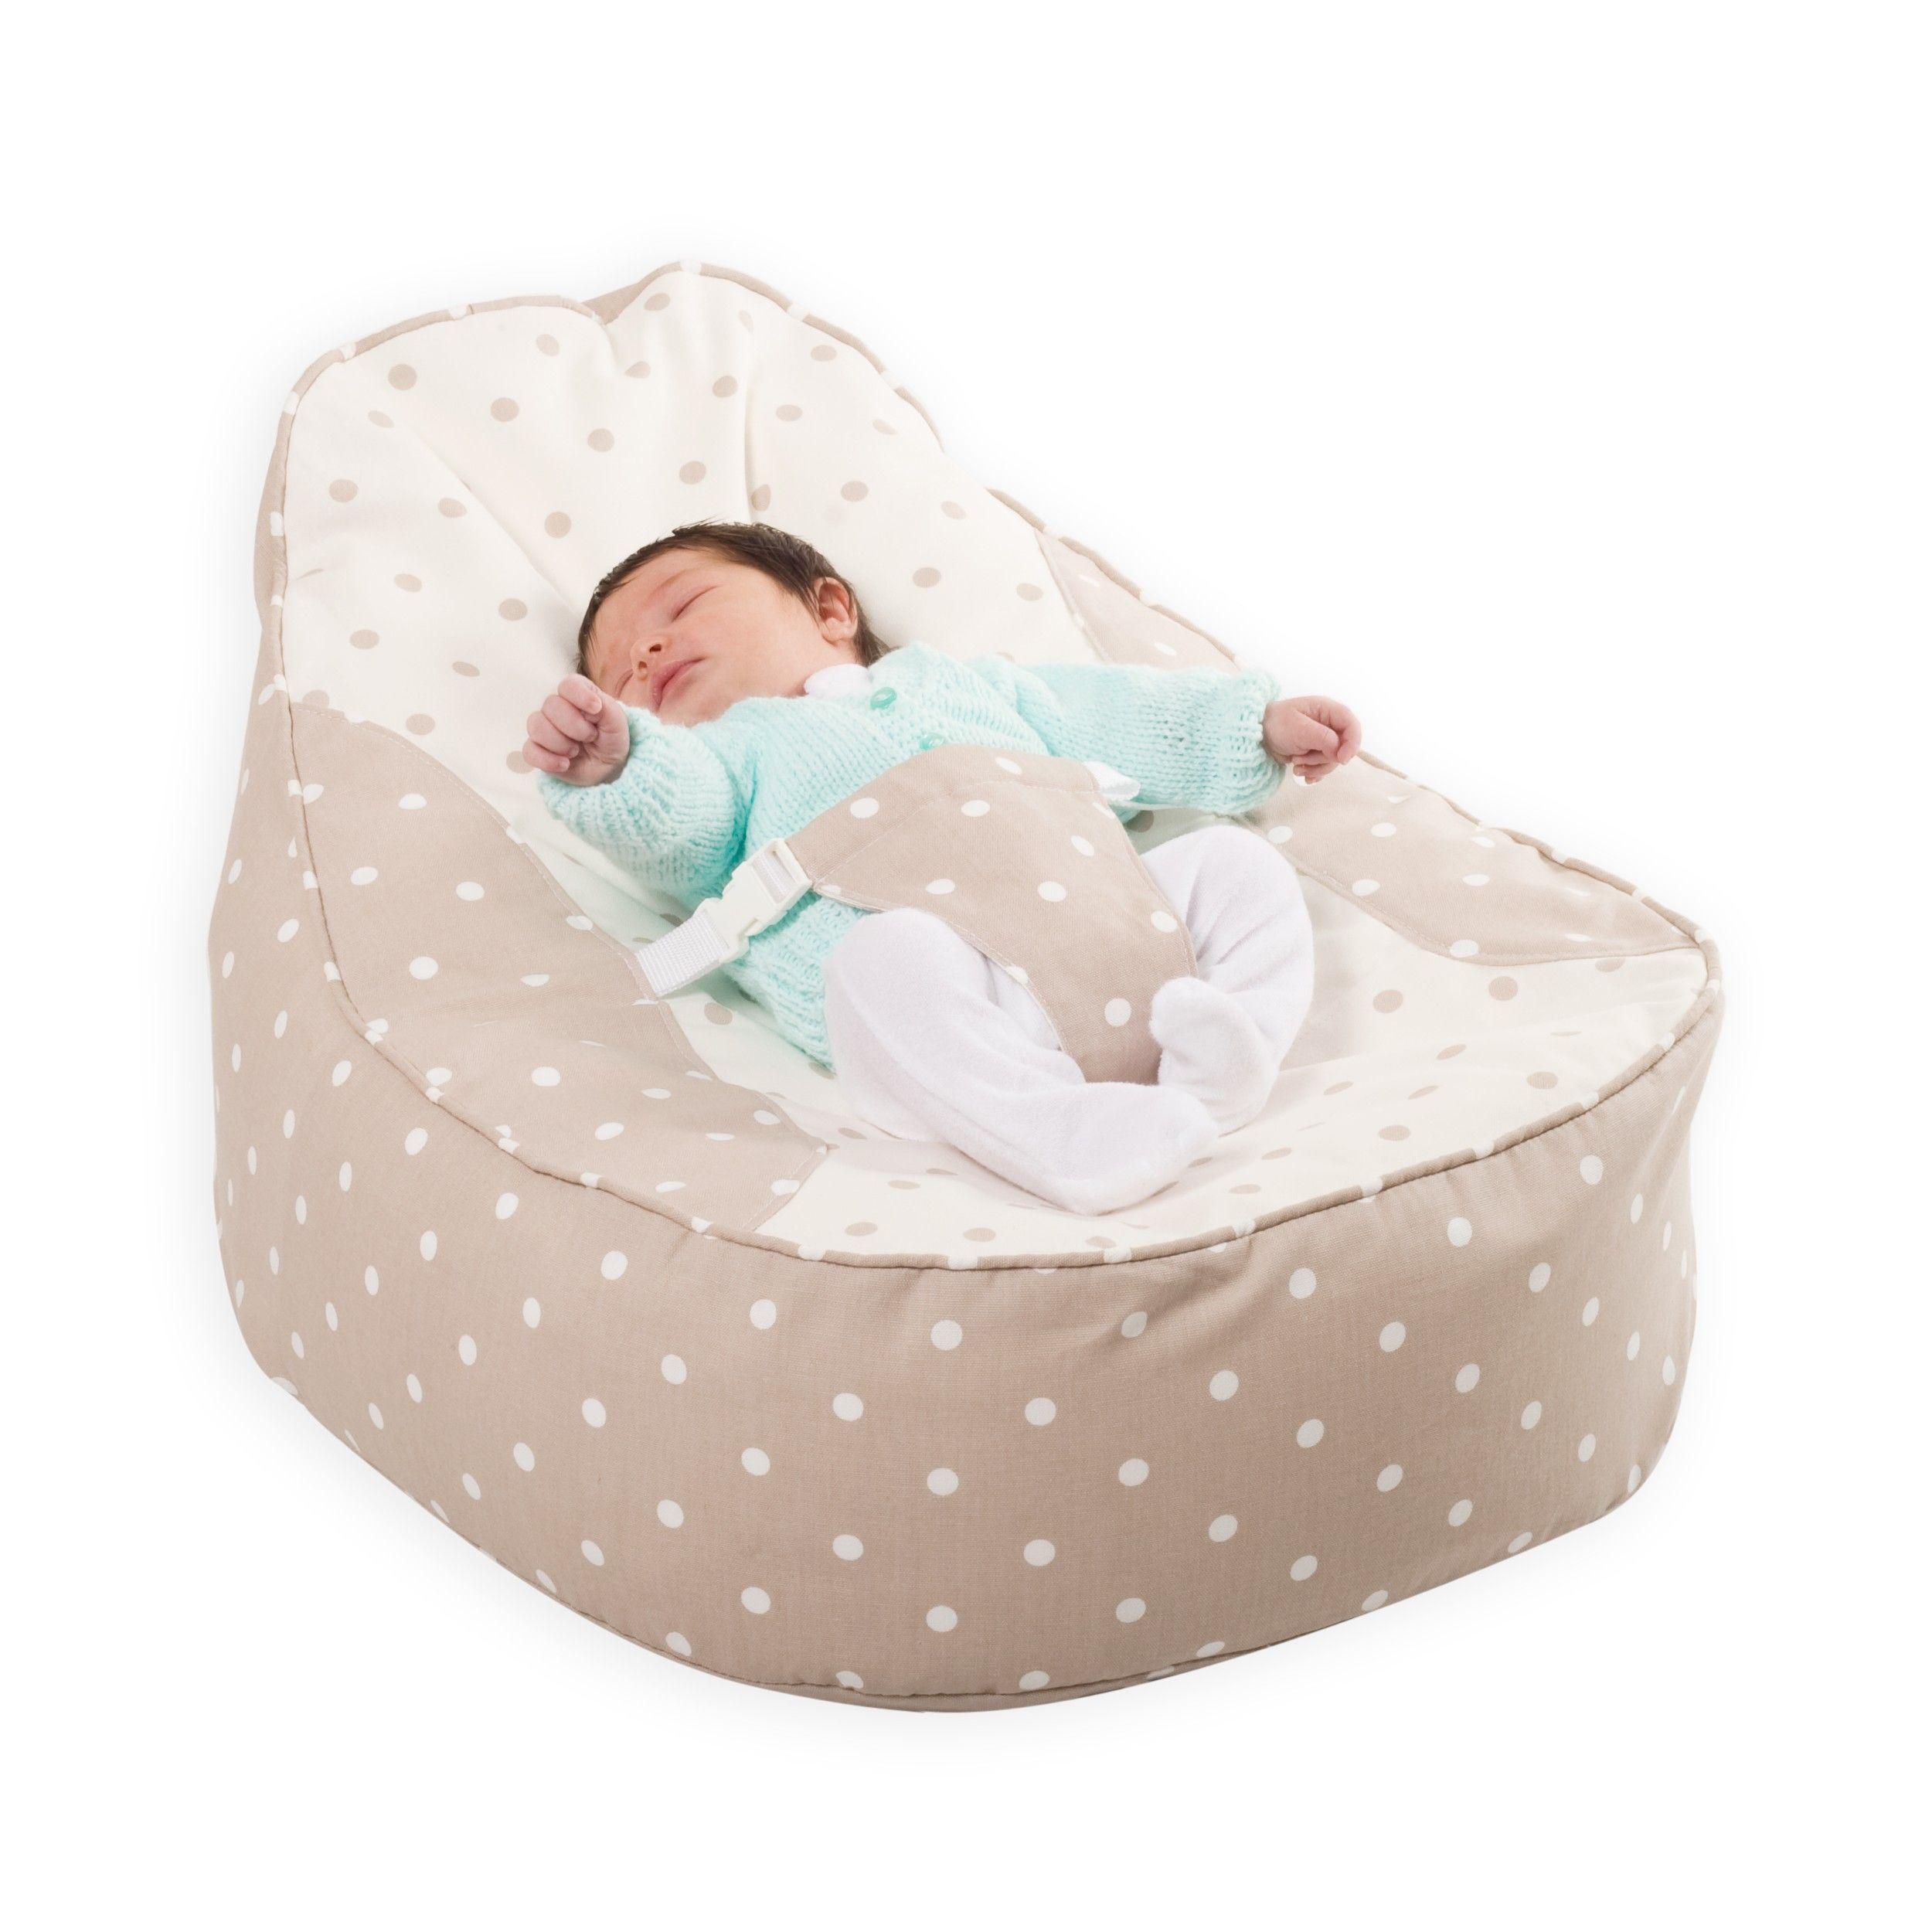 Surprising Bought Two Of These Bambeano Baby Bean Bag Motherhood Machost Co Dining Chair Design Ideas Machostcouk